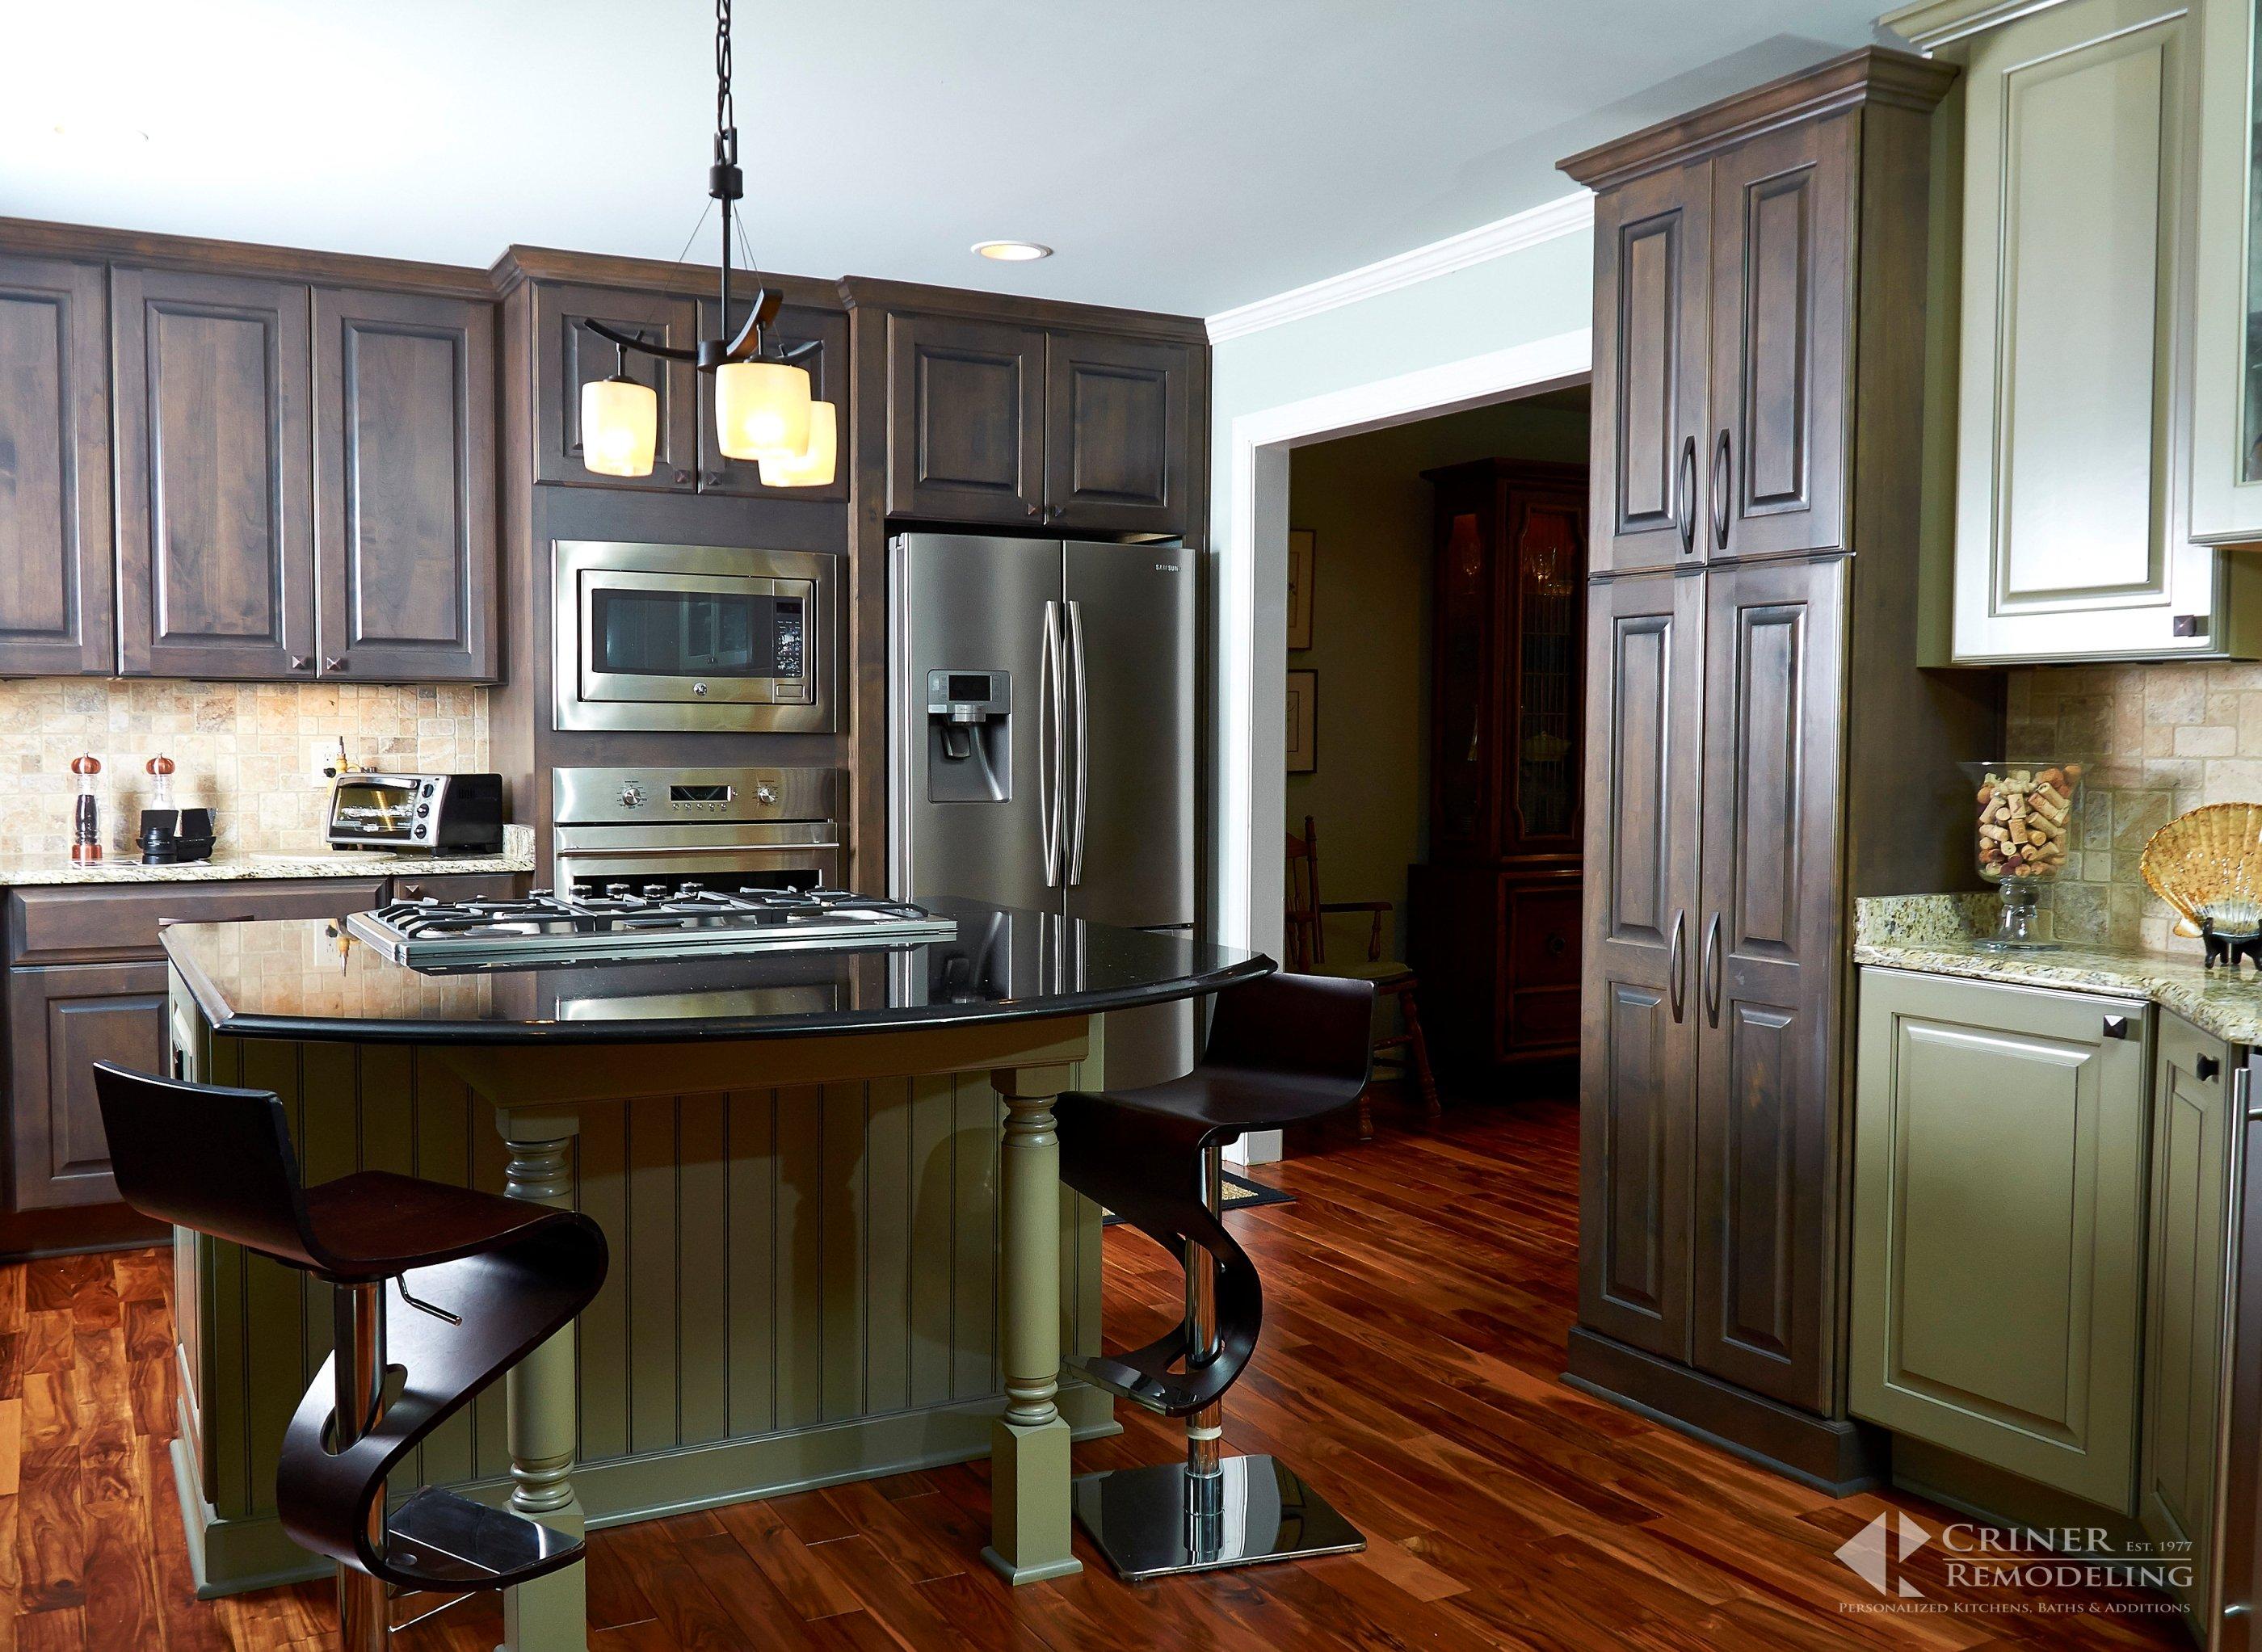 Bathroom Remodeling Yorktown Va kitchen gallery - criner remodeling